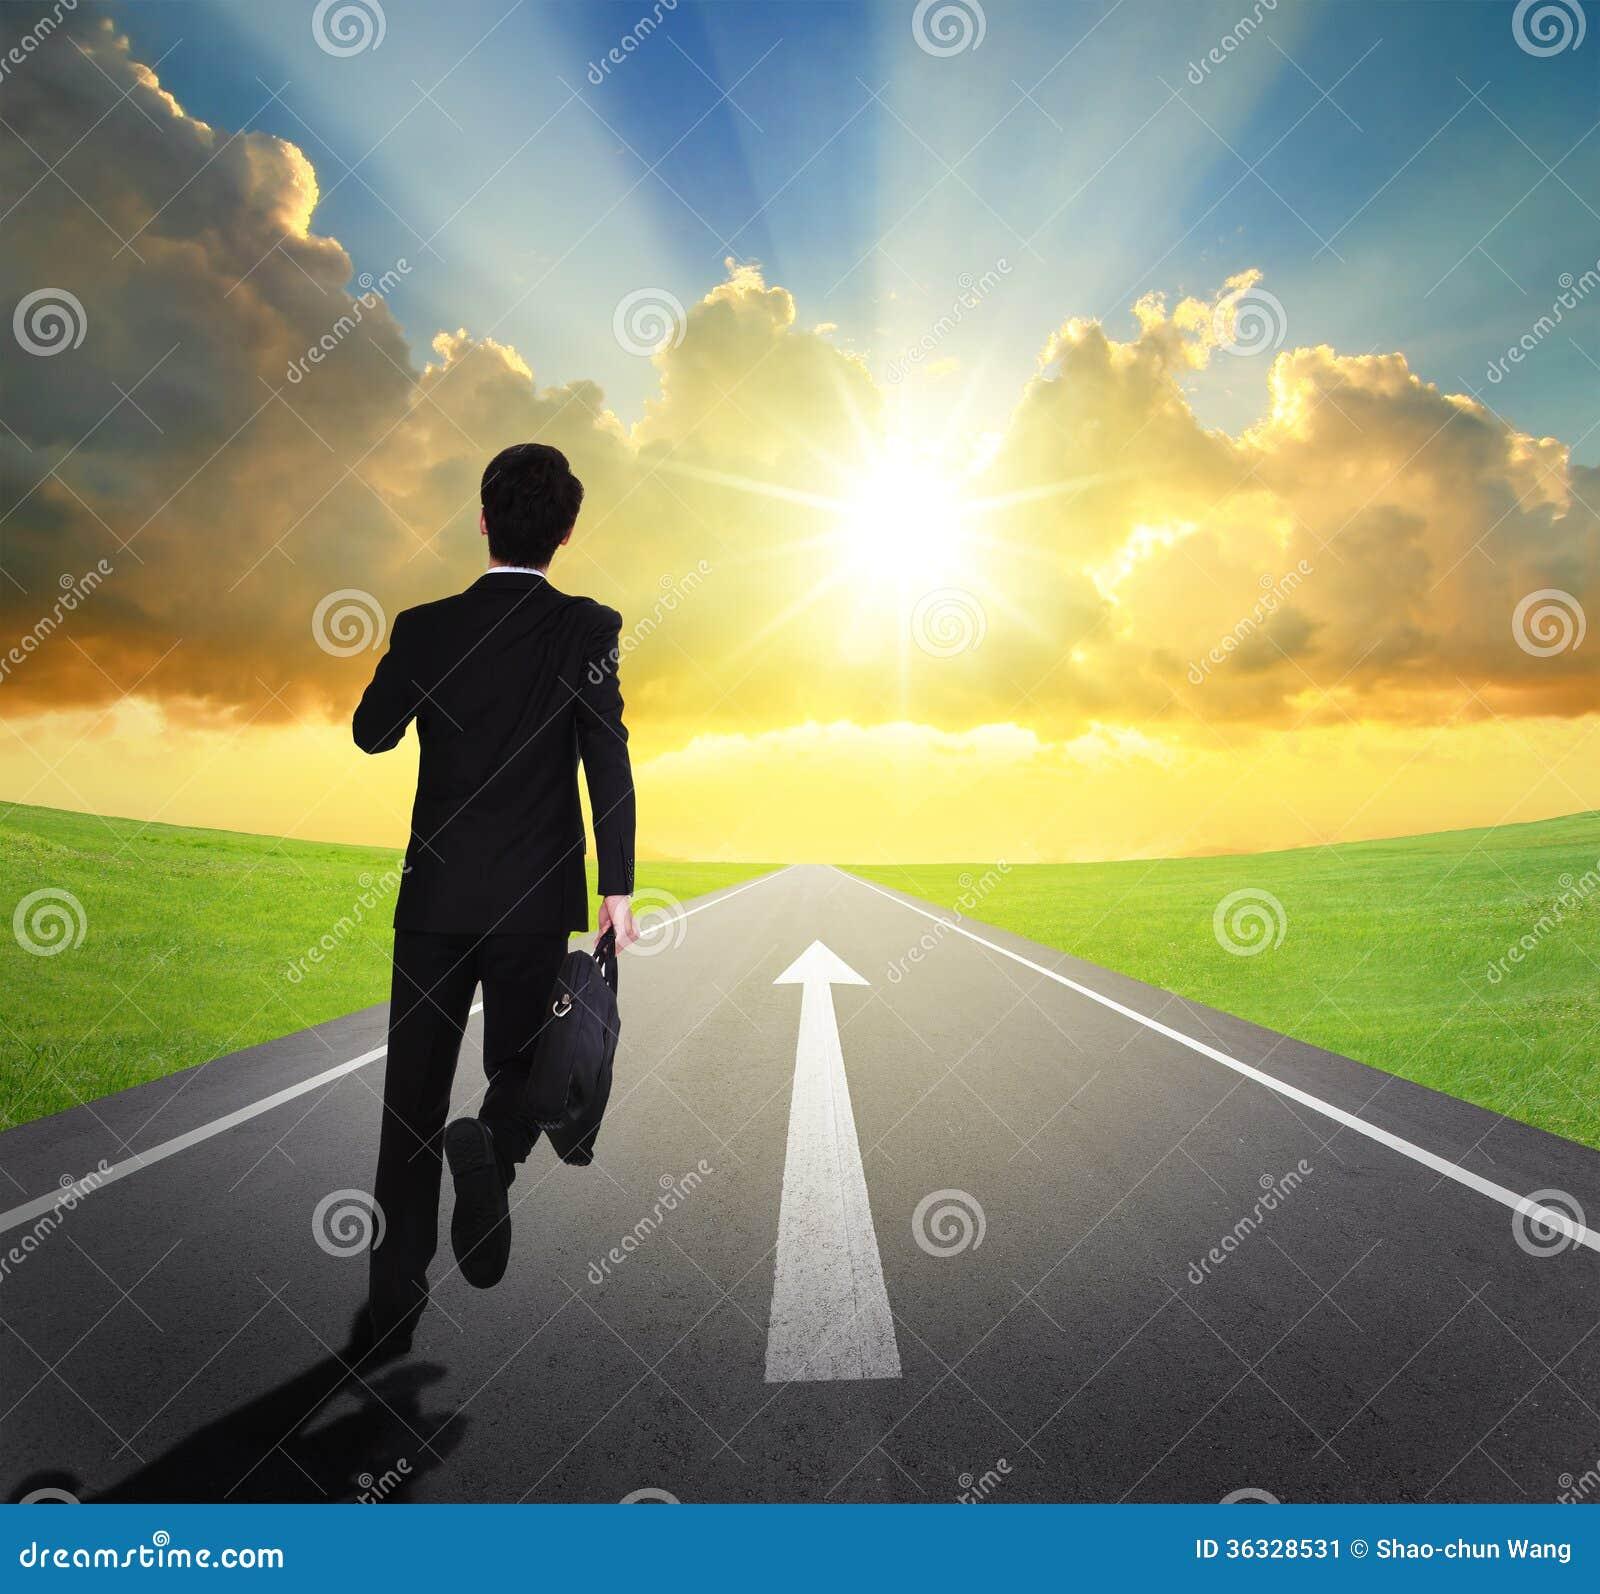 Business man running on asphalt road